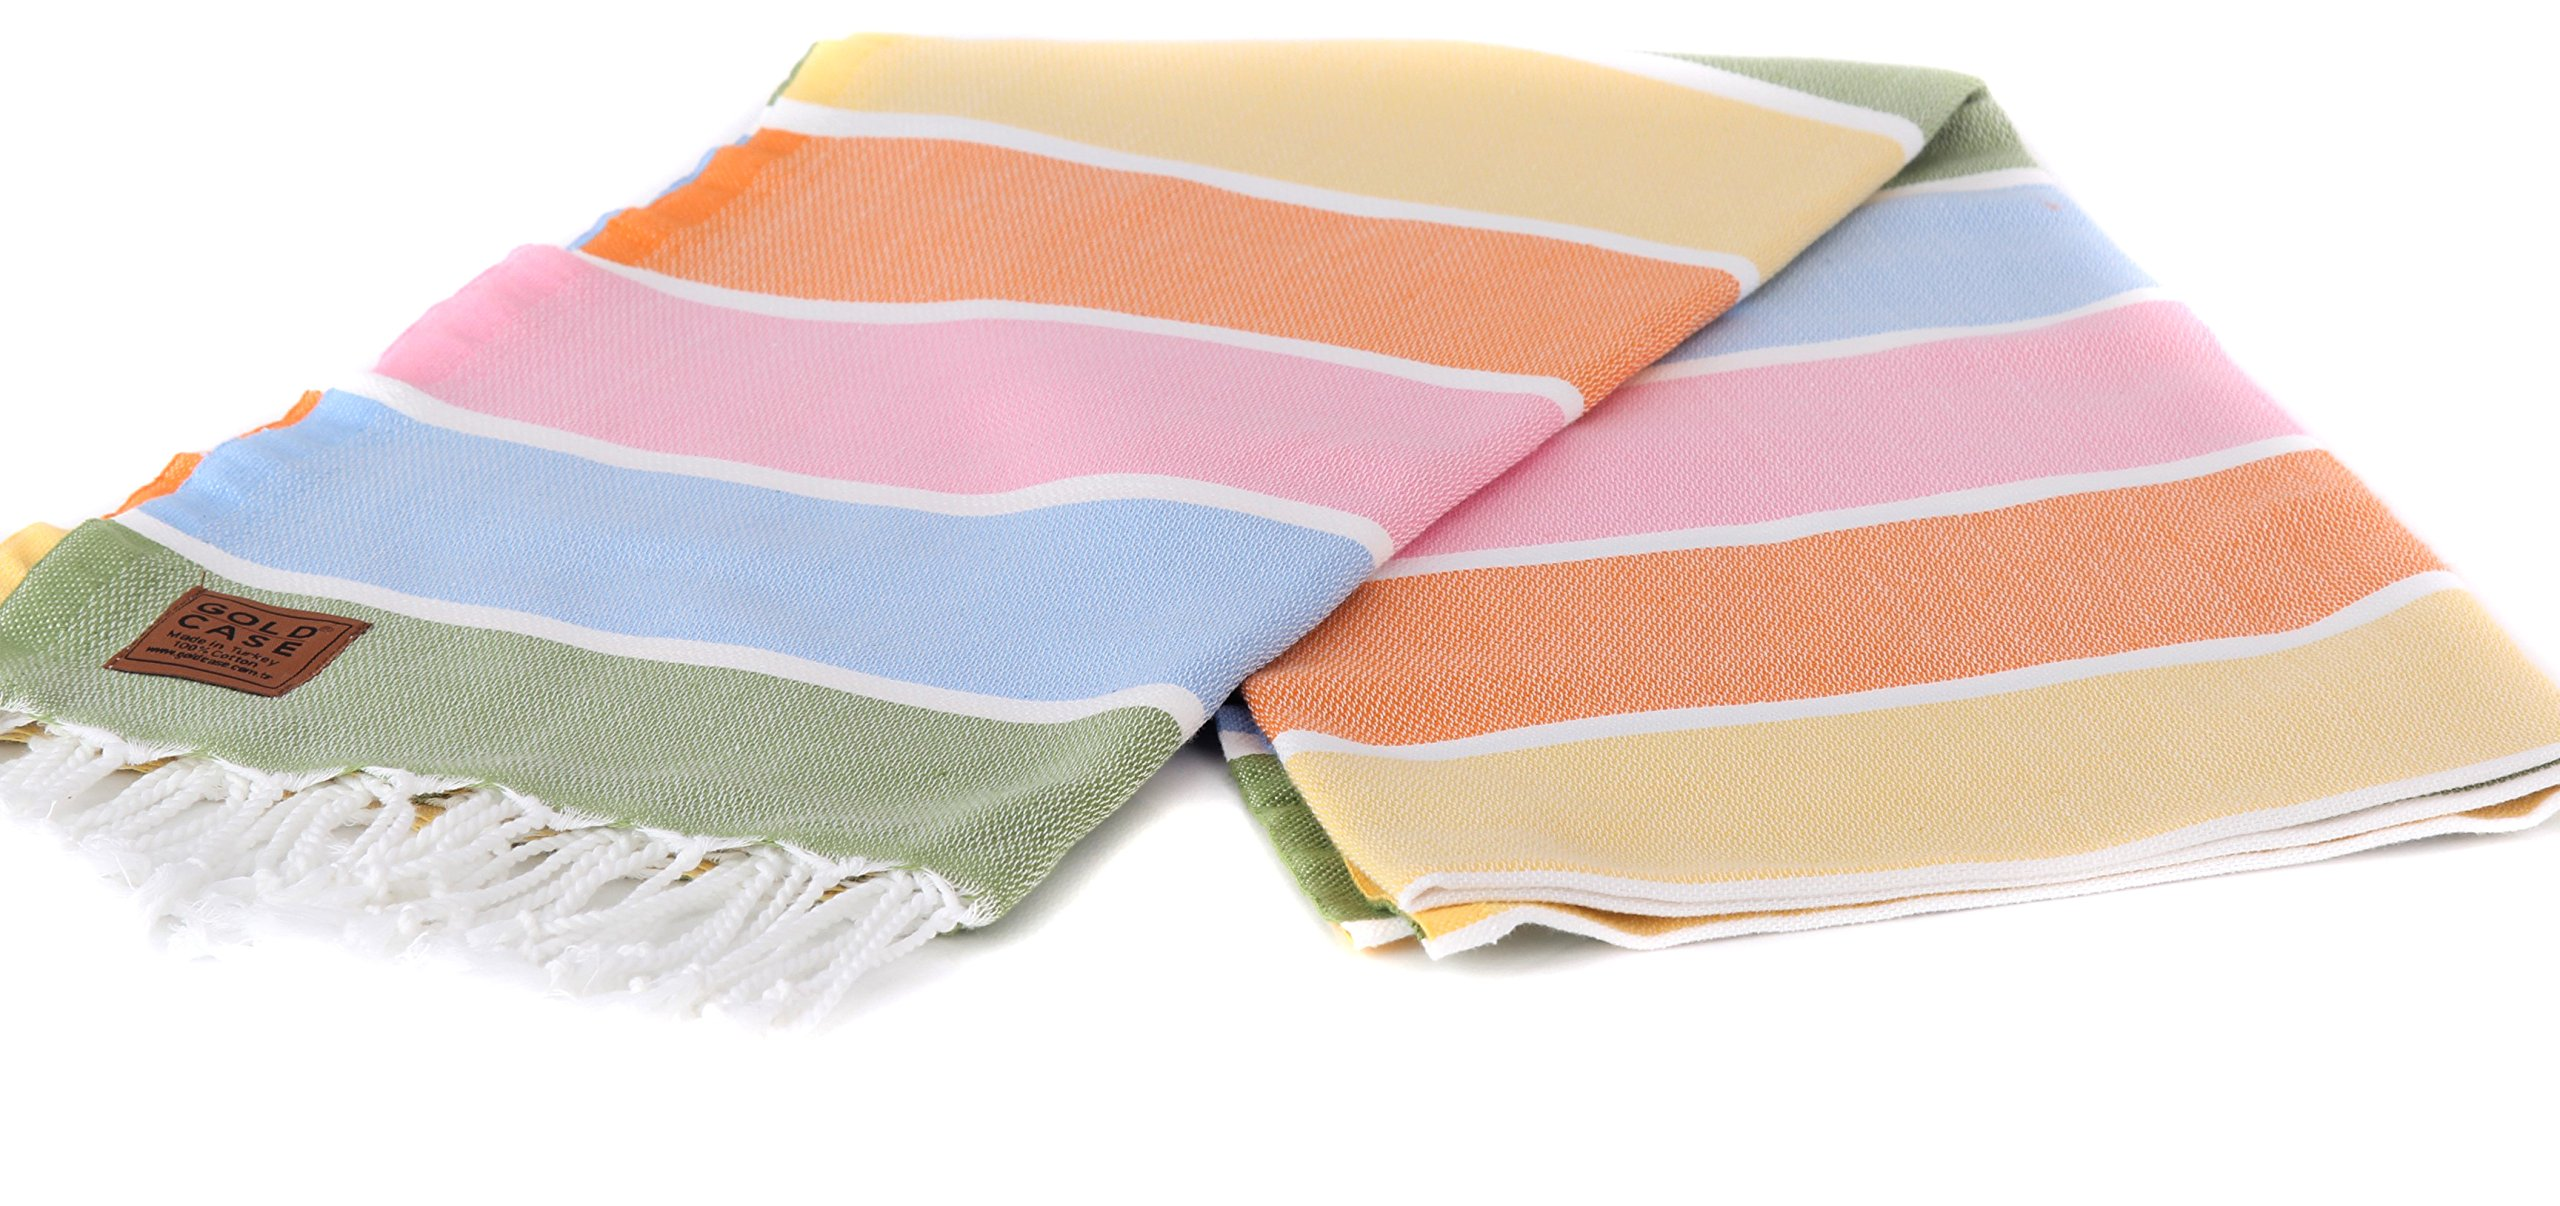 Gold Case NYSA pestemal Exclusive Group - Made in Turkey / 100% Cotton - Bath-Beach-Sauna-Hamam-Spa-Yoga-Picnic Turkish Towel - 39x70(100x180cm) Big Size Peshtemal, 1x-Yellow-Orange